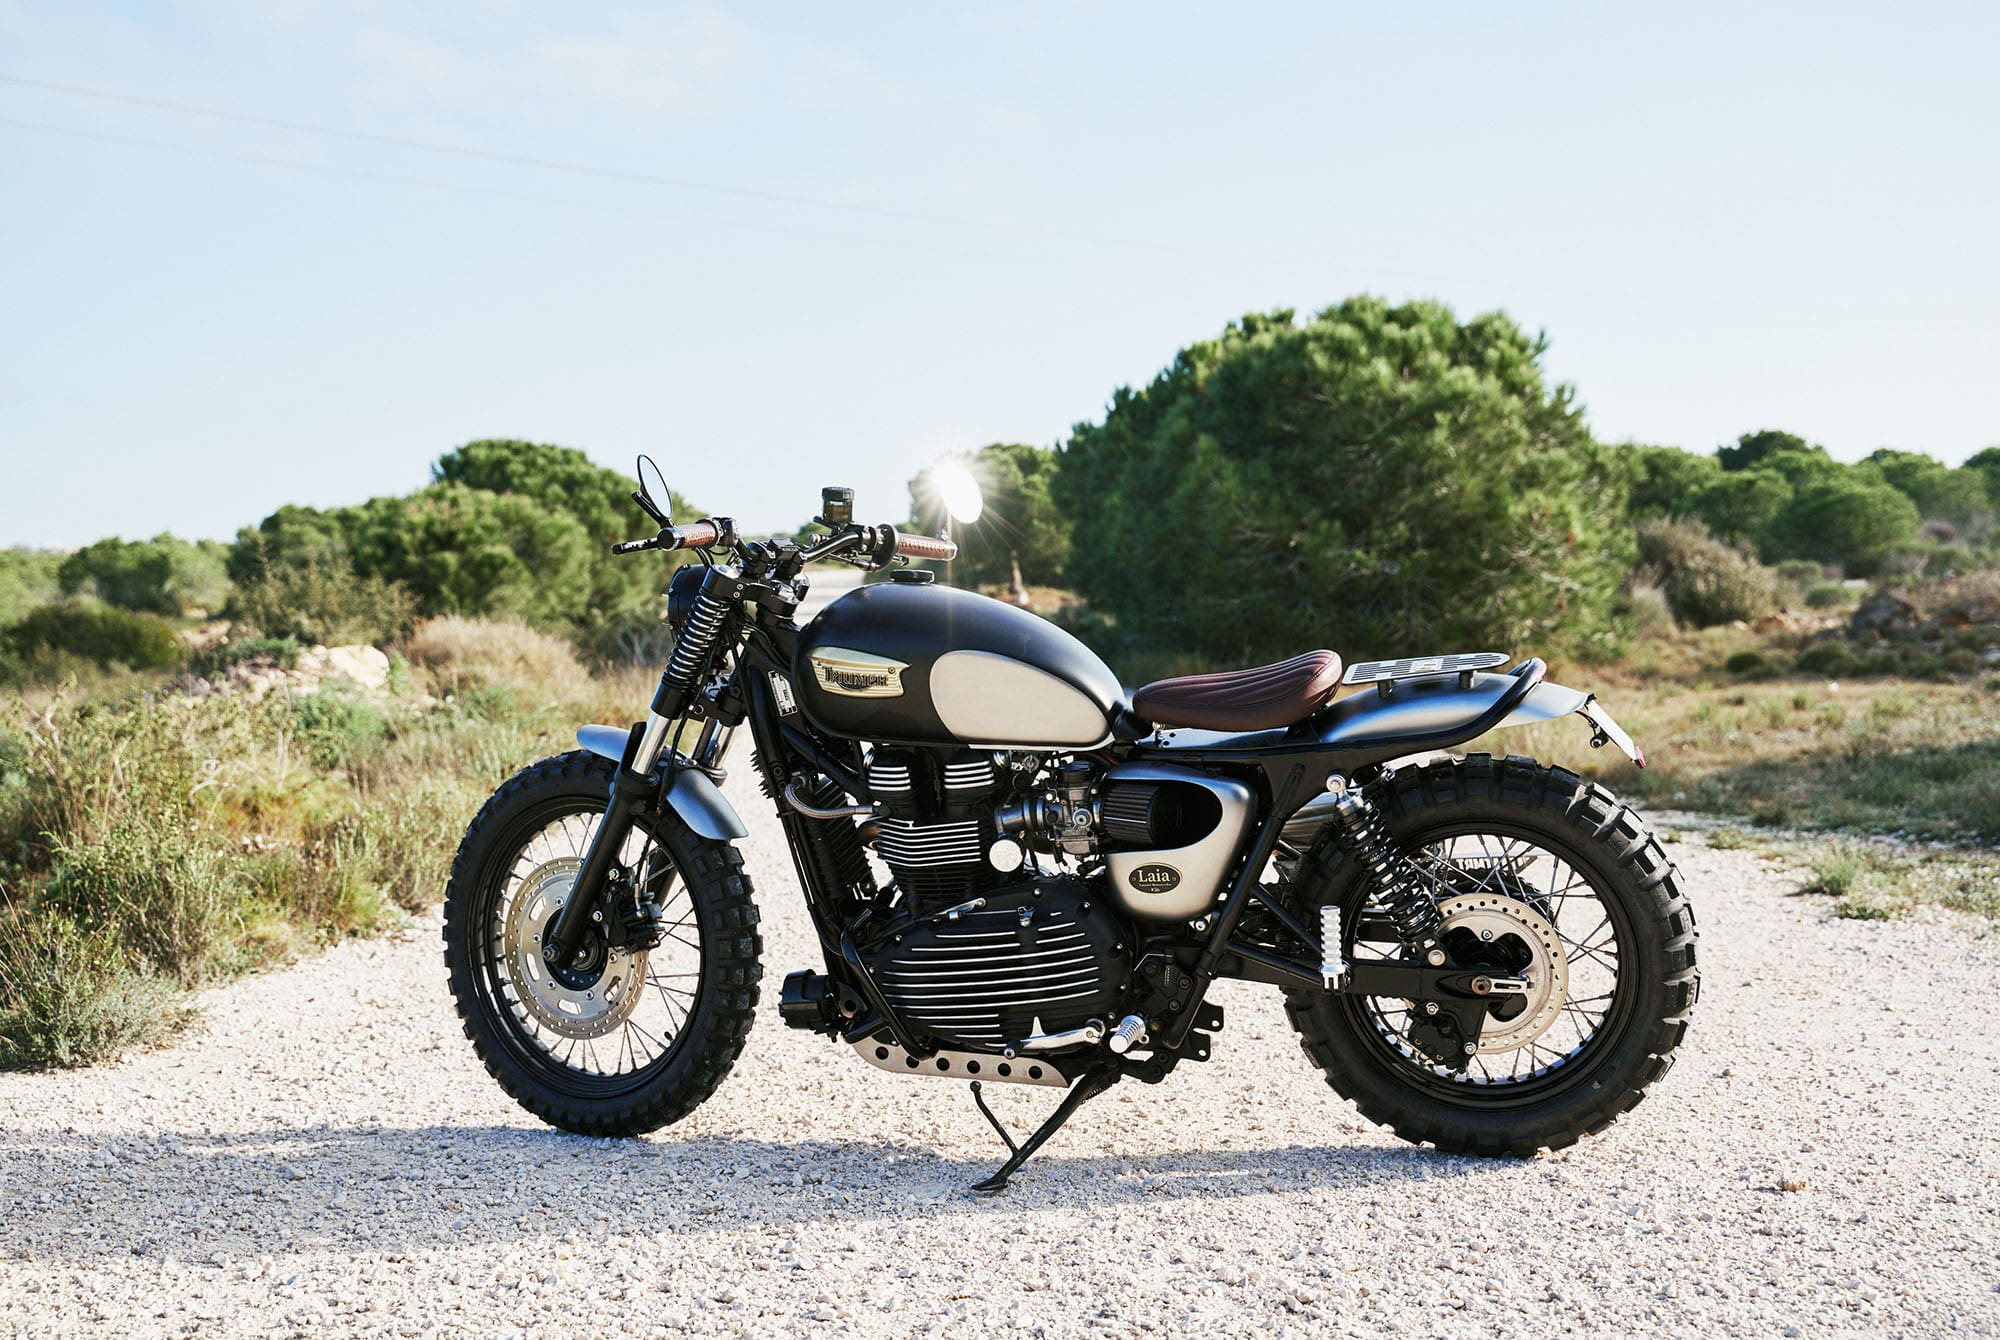 Tamarit Motorcycles